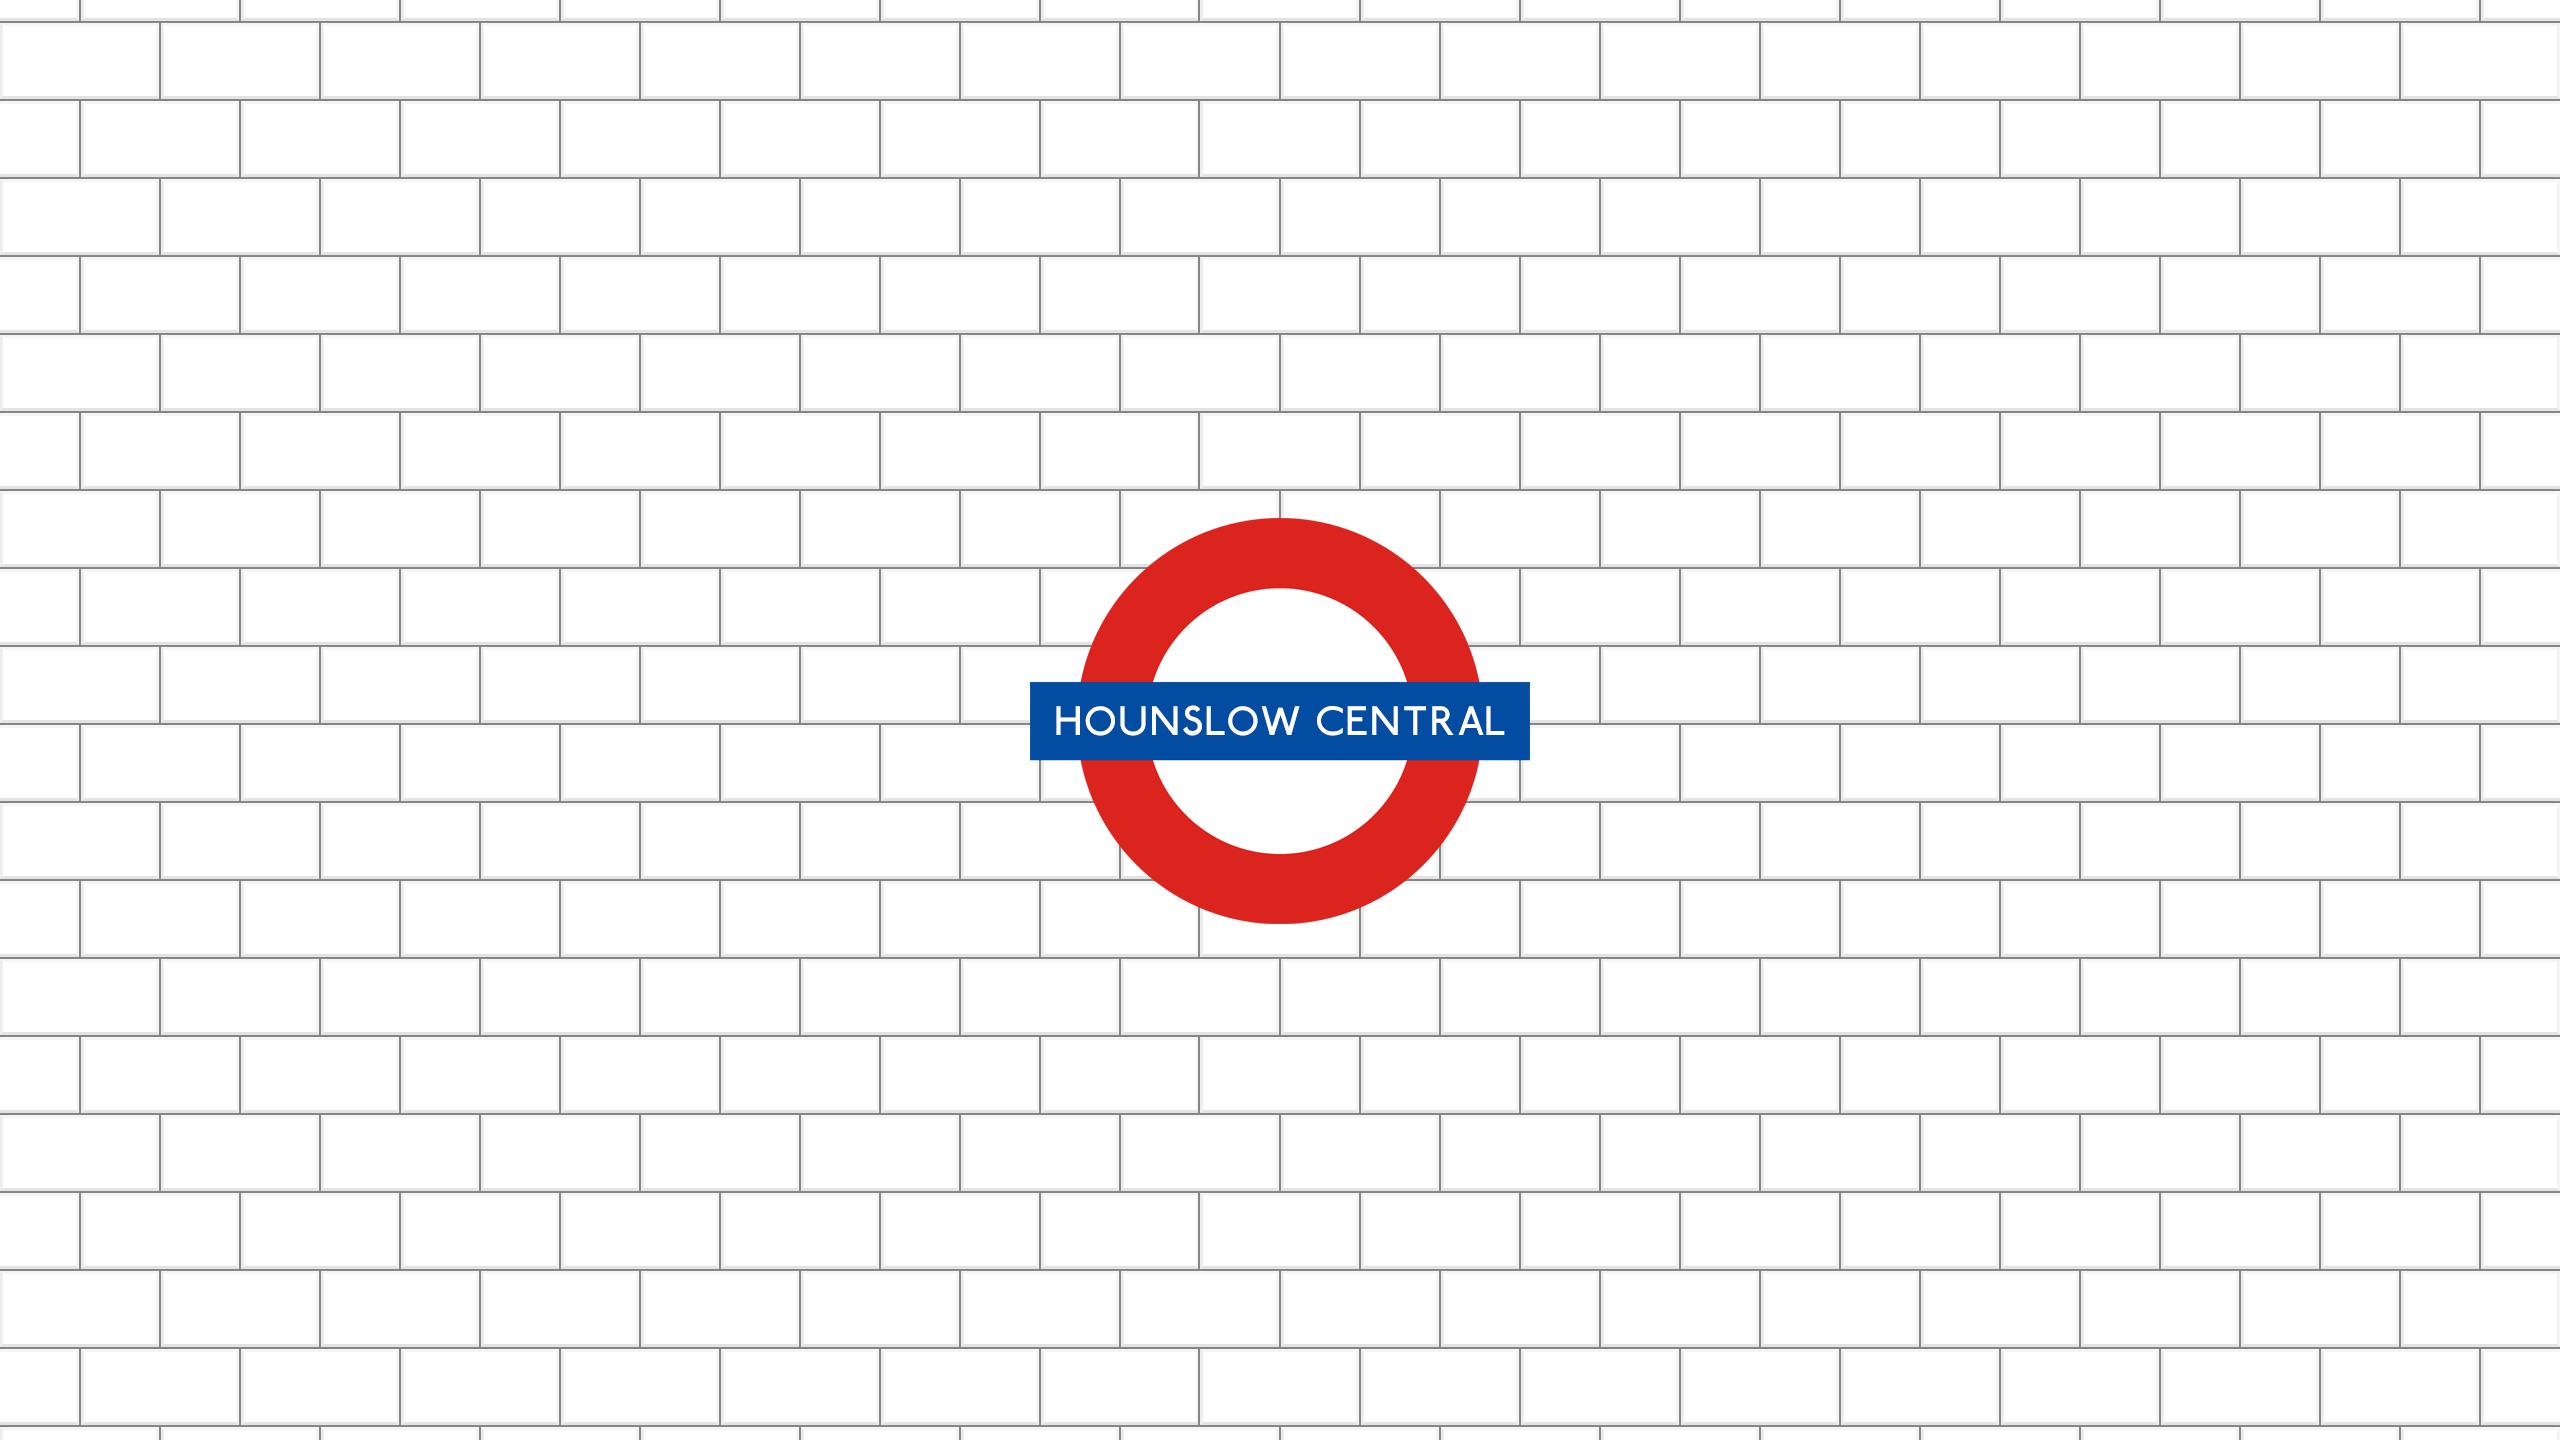 Hounslow Central